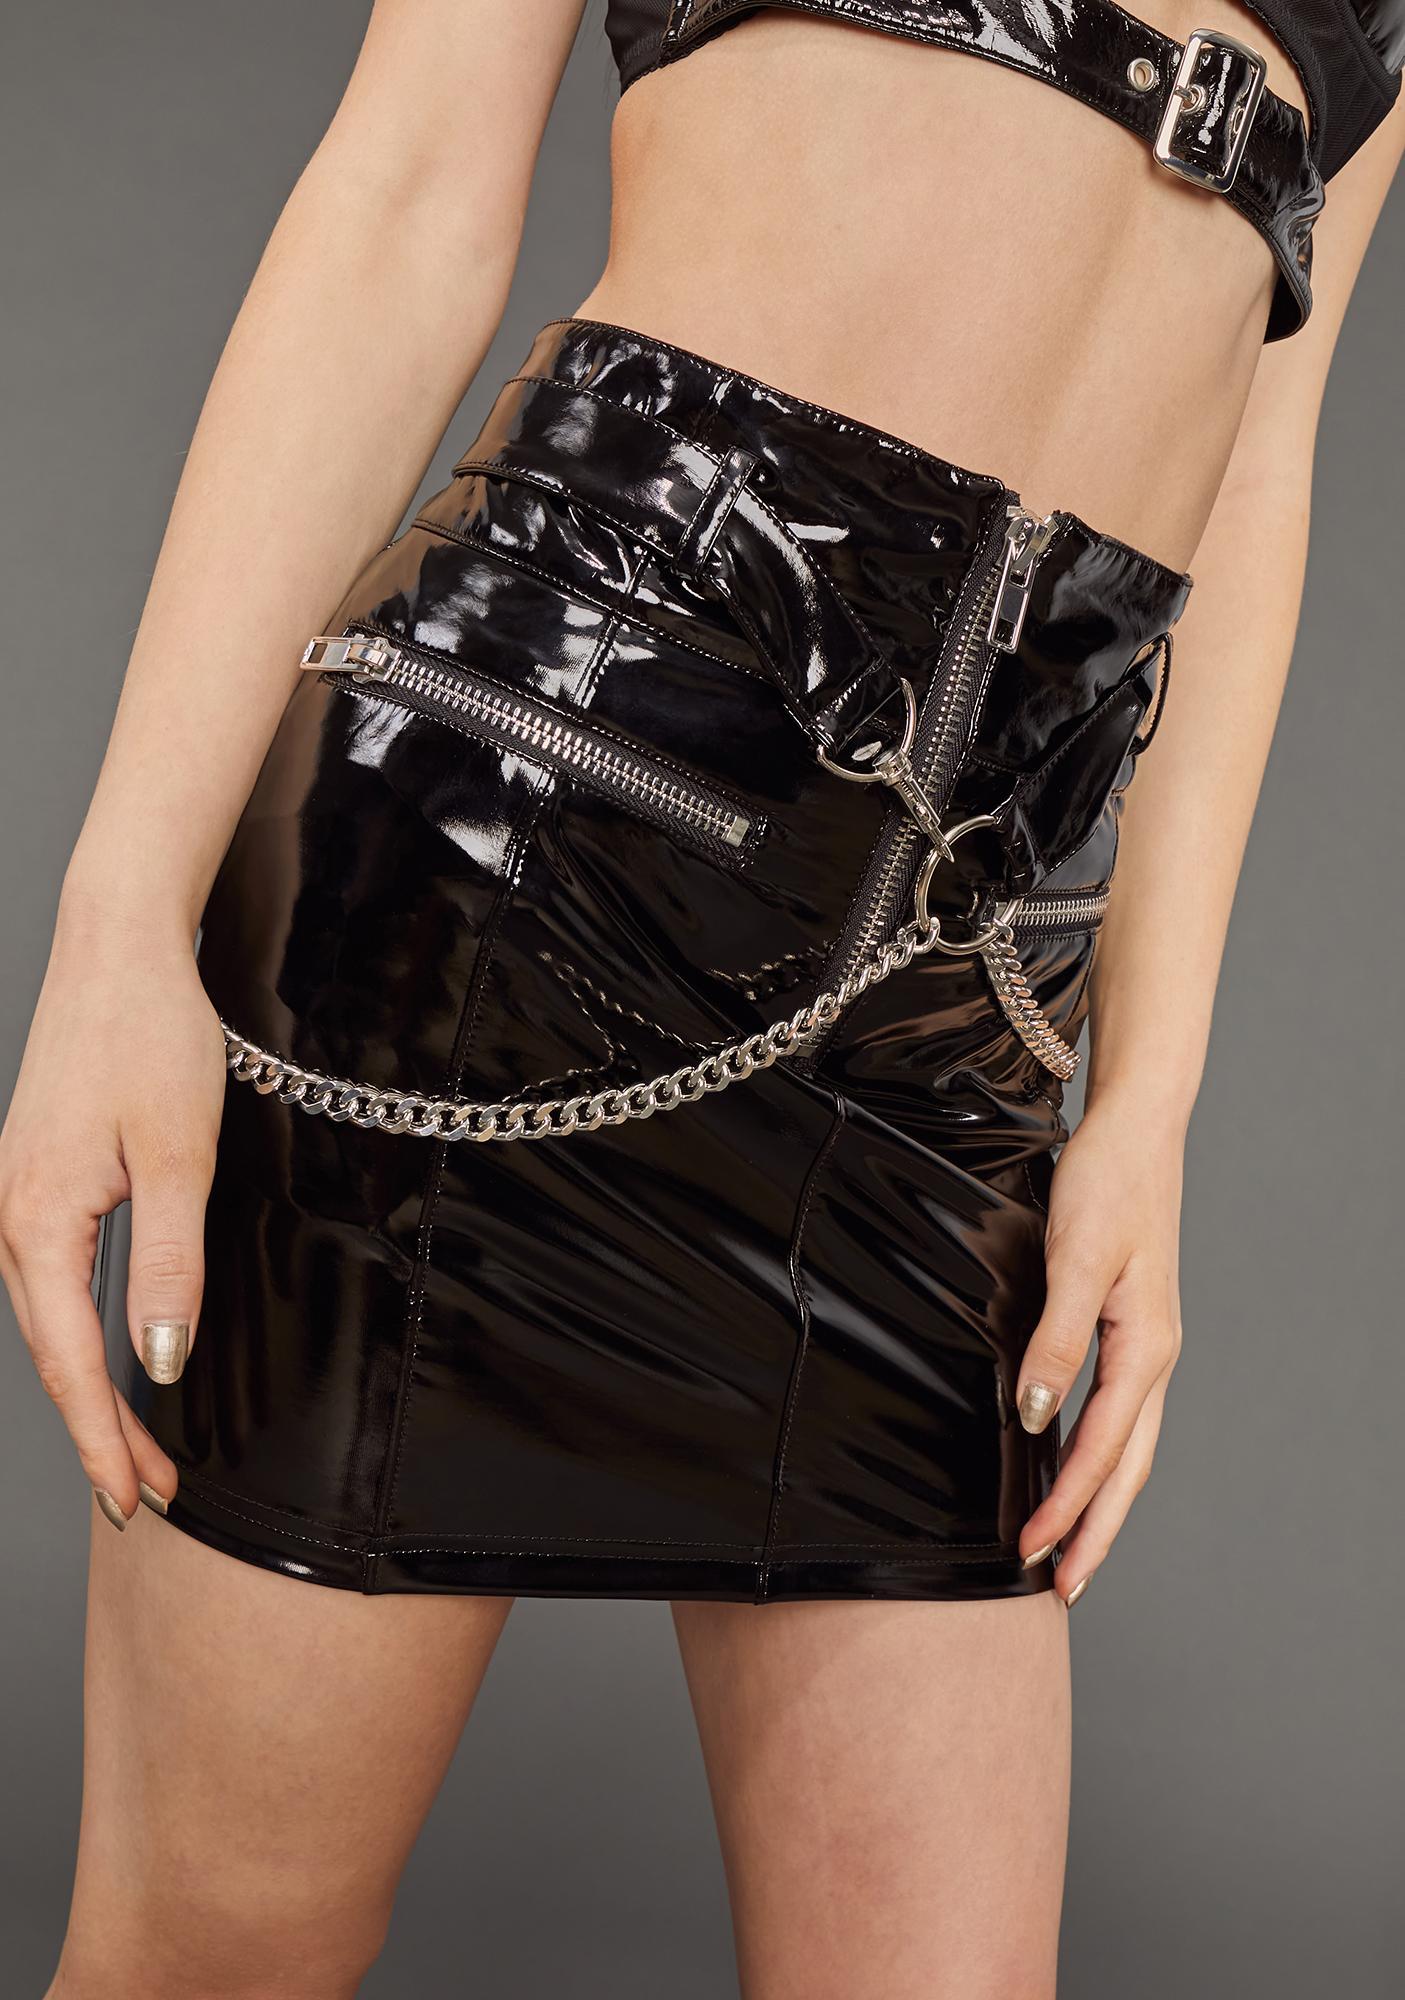 Poster Grl Hard To Impress Patent Skirt